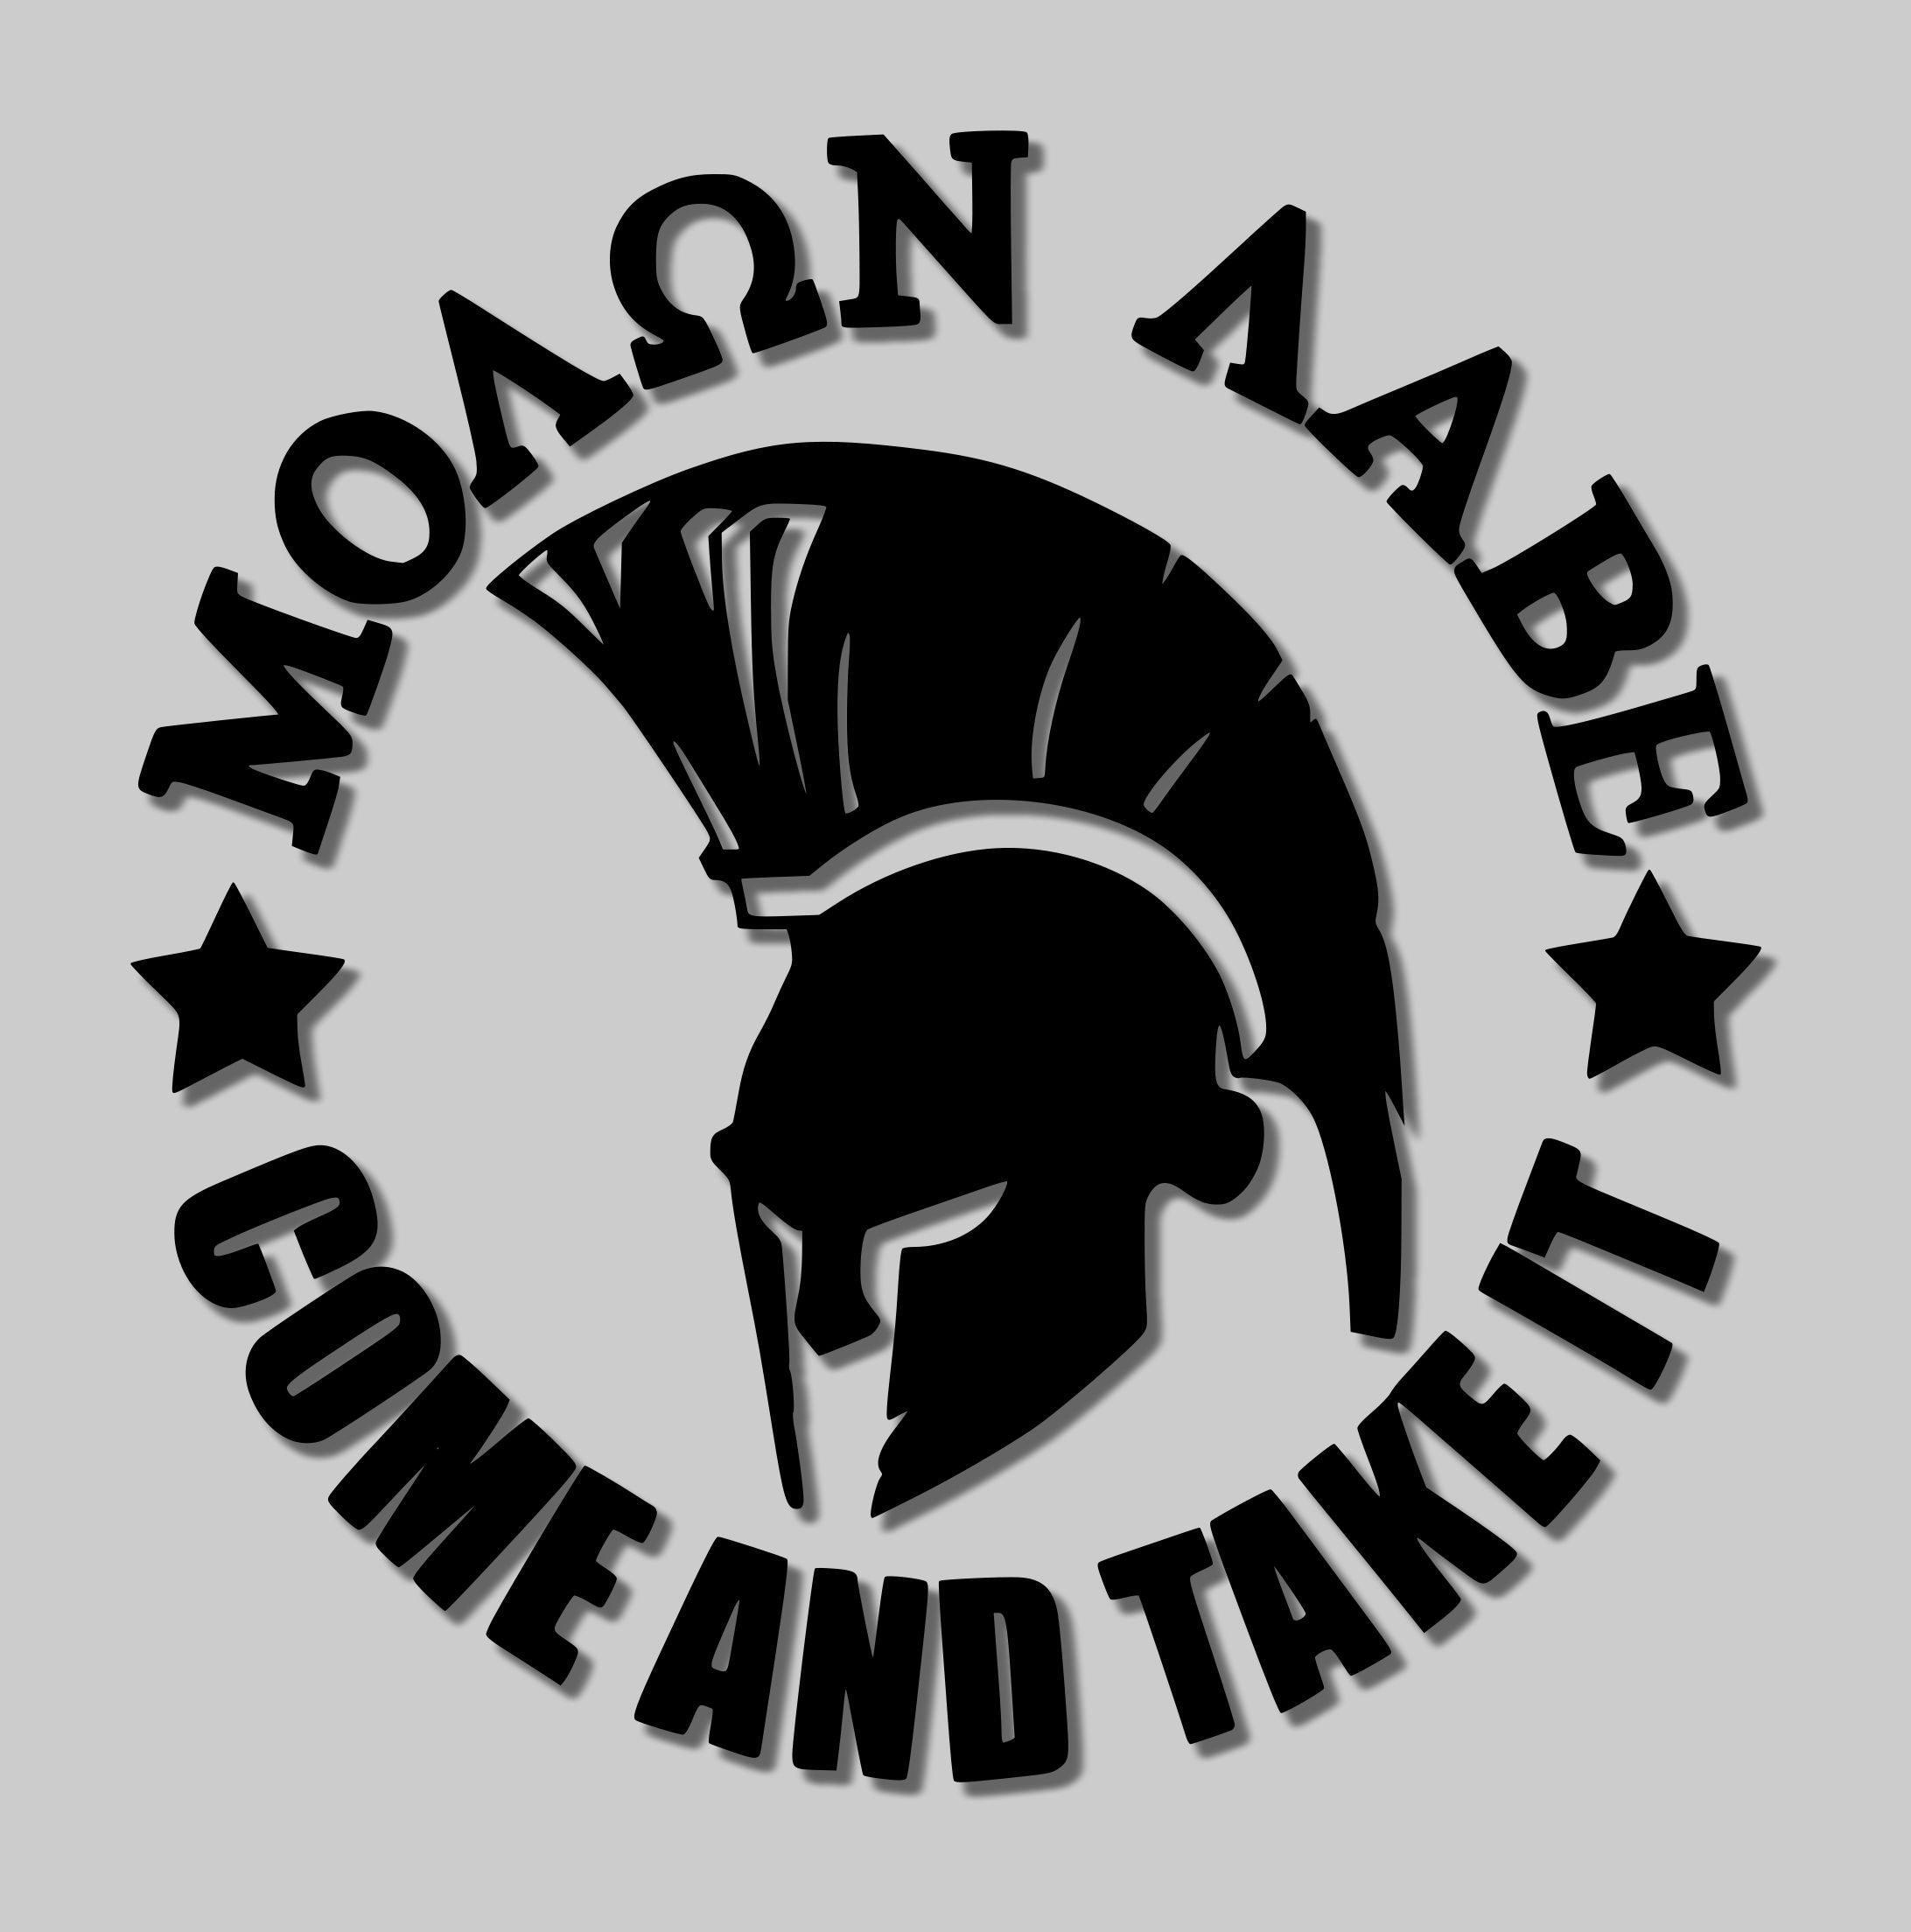 Molon Labe Decal Molon Labe Decal Custom Letters Vinyl Decals